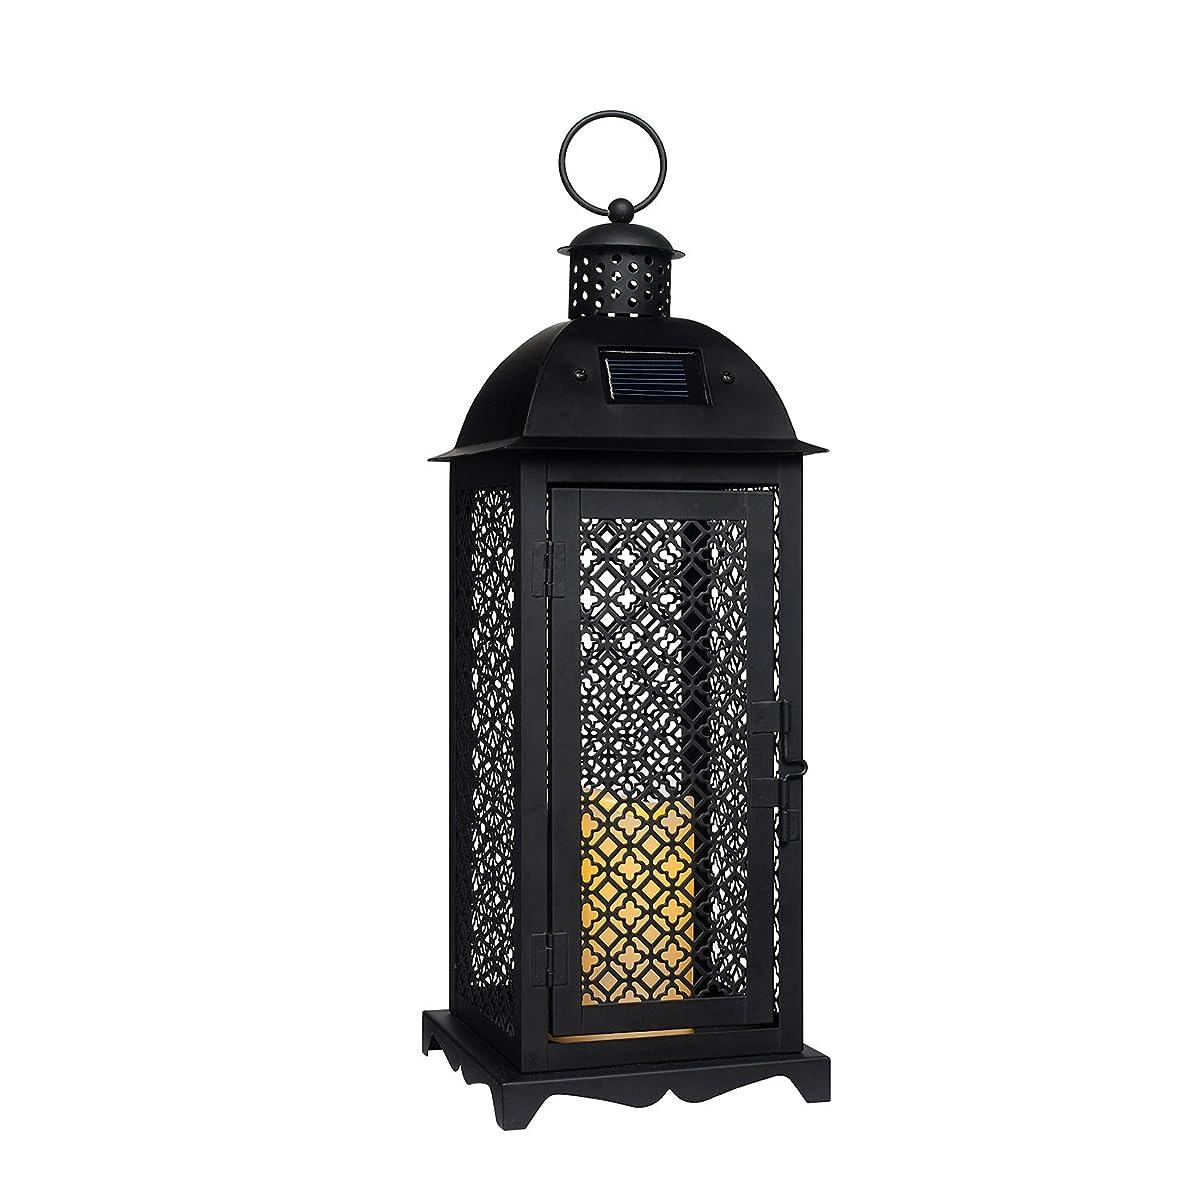 Moroccan Solar Powered LED Garden Flameless Candle Lantern